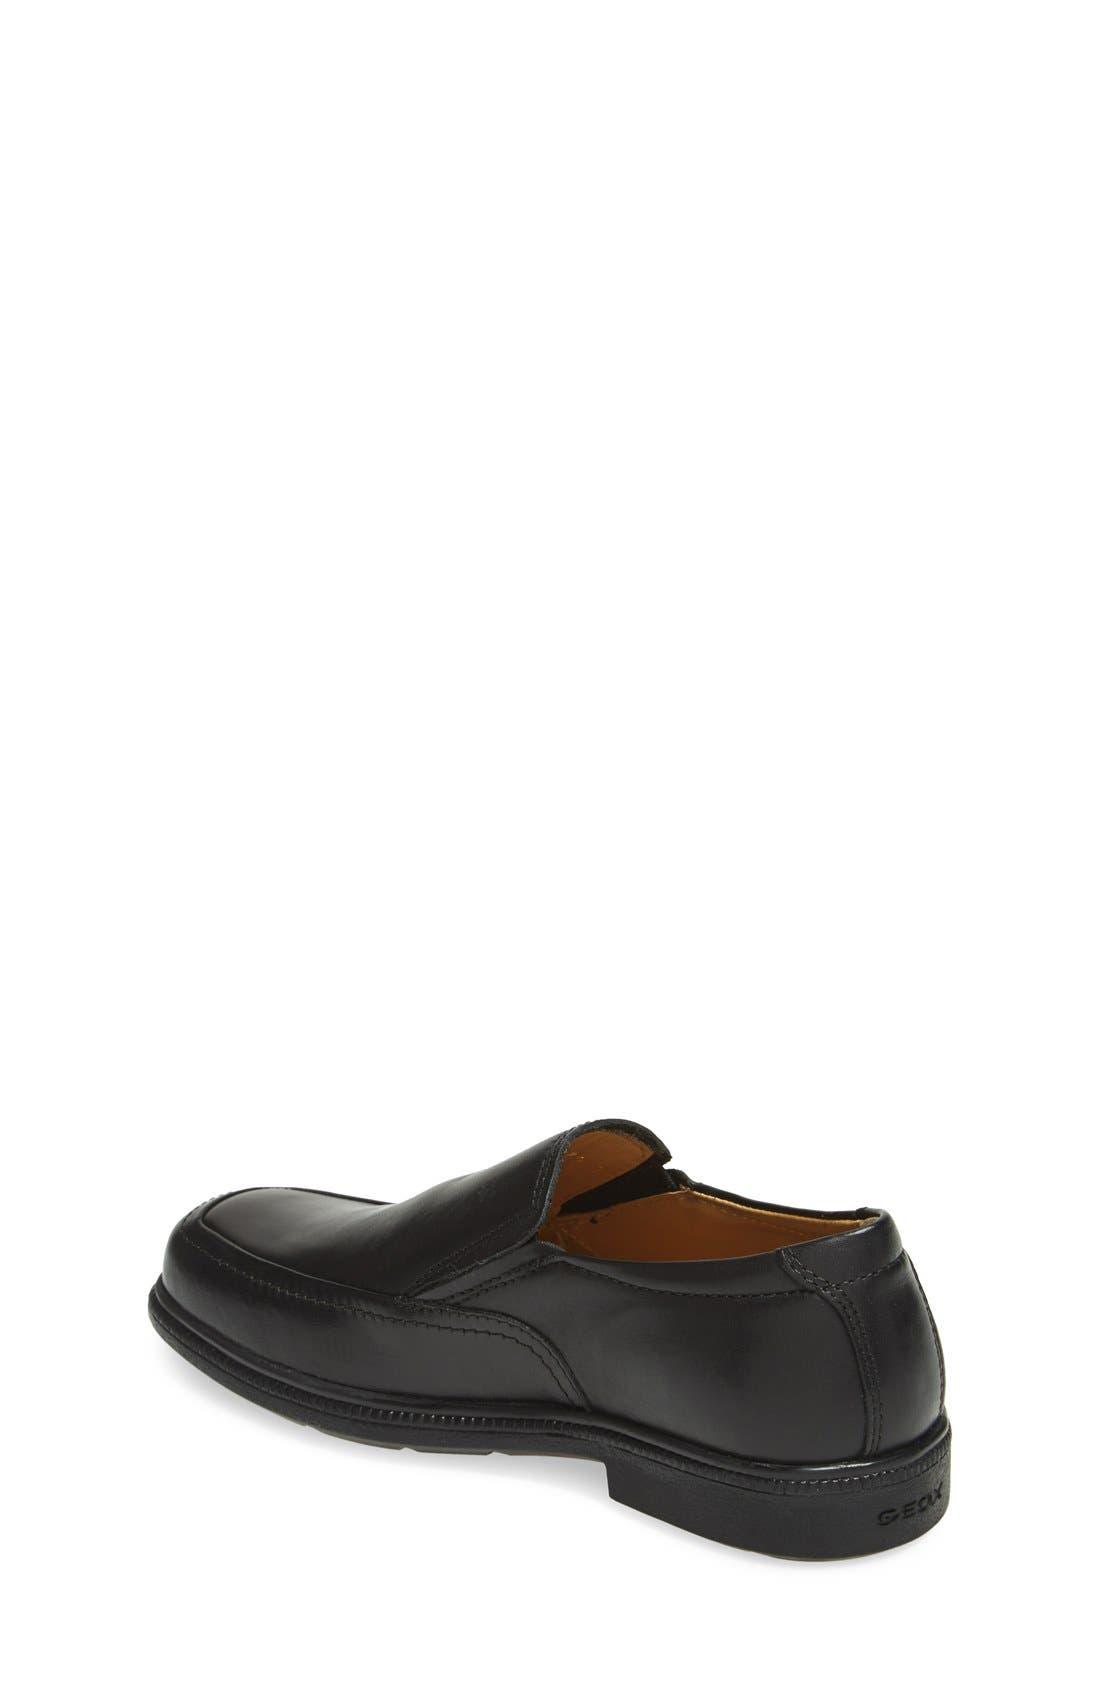 'Federico' Loafer,                             Alternate thumbnail 2, color,                             Black